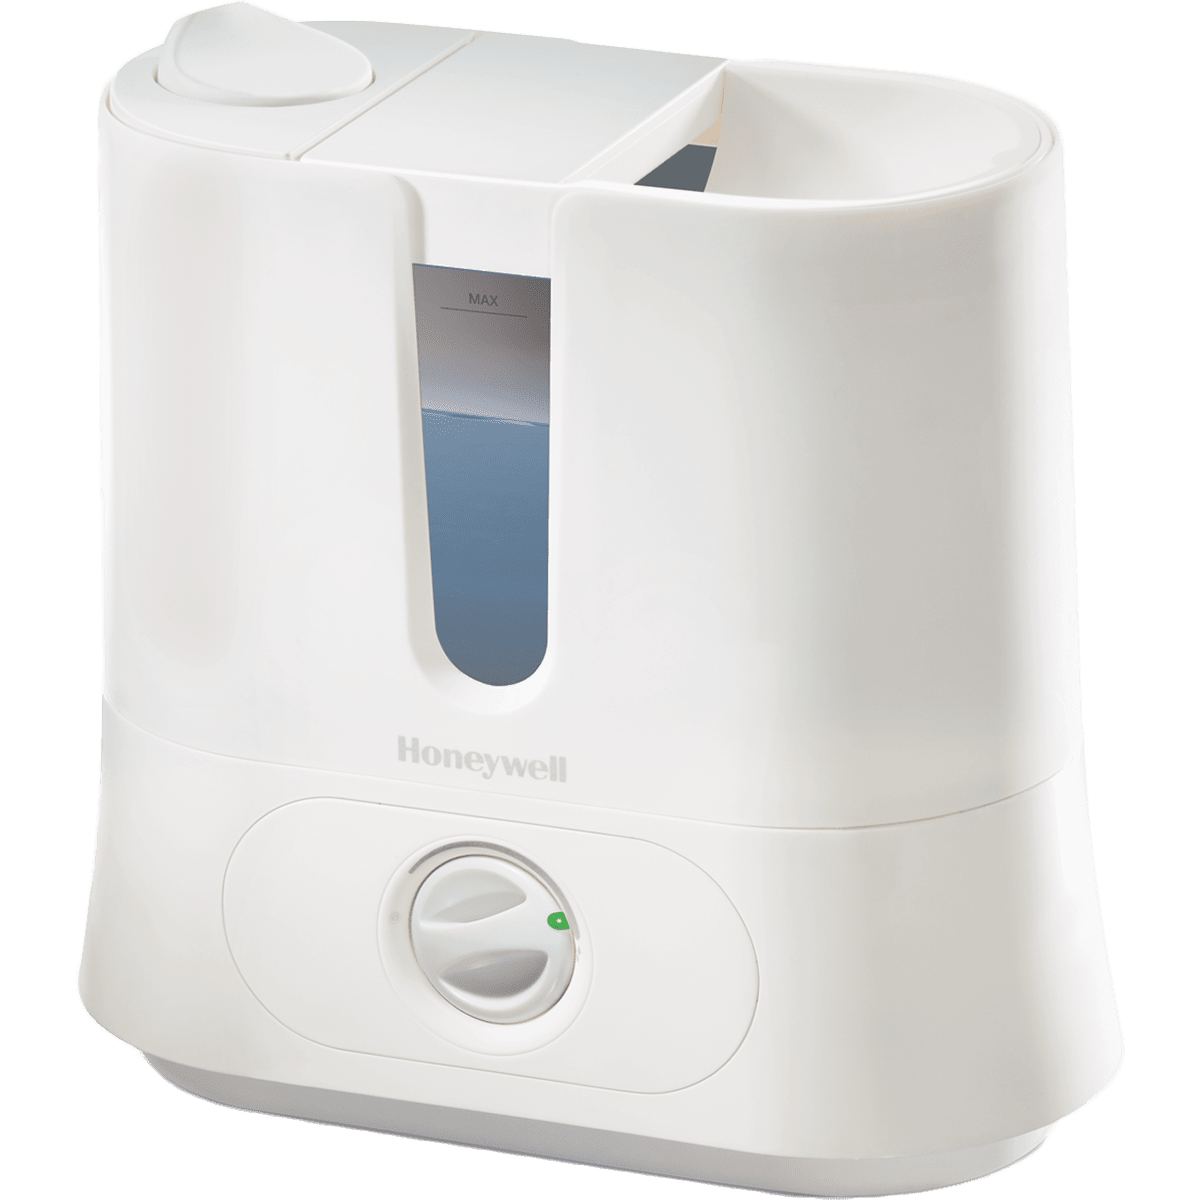 Honeywell HUL570 Cool Mist Ultrasonic Humidifier ho5837